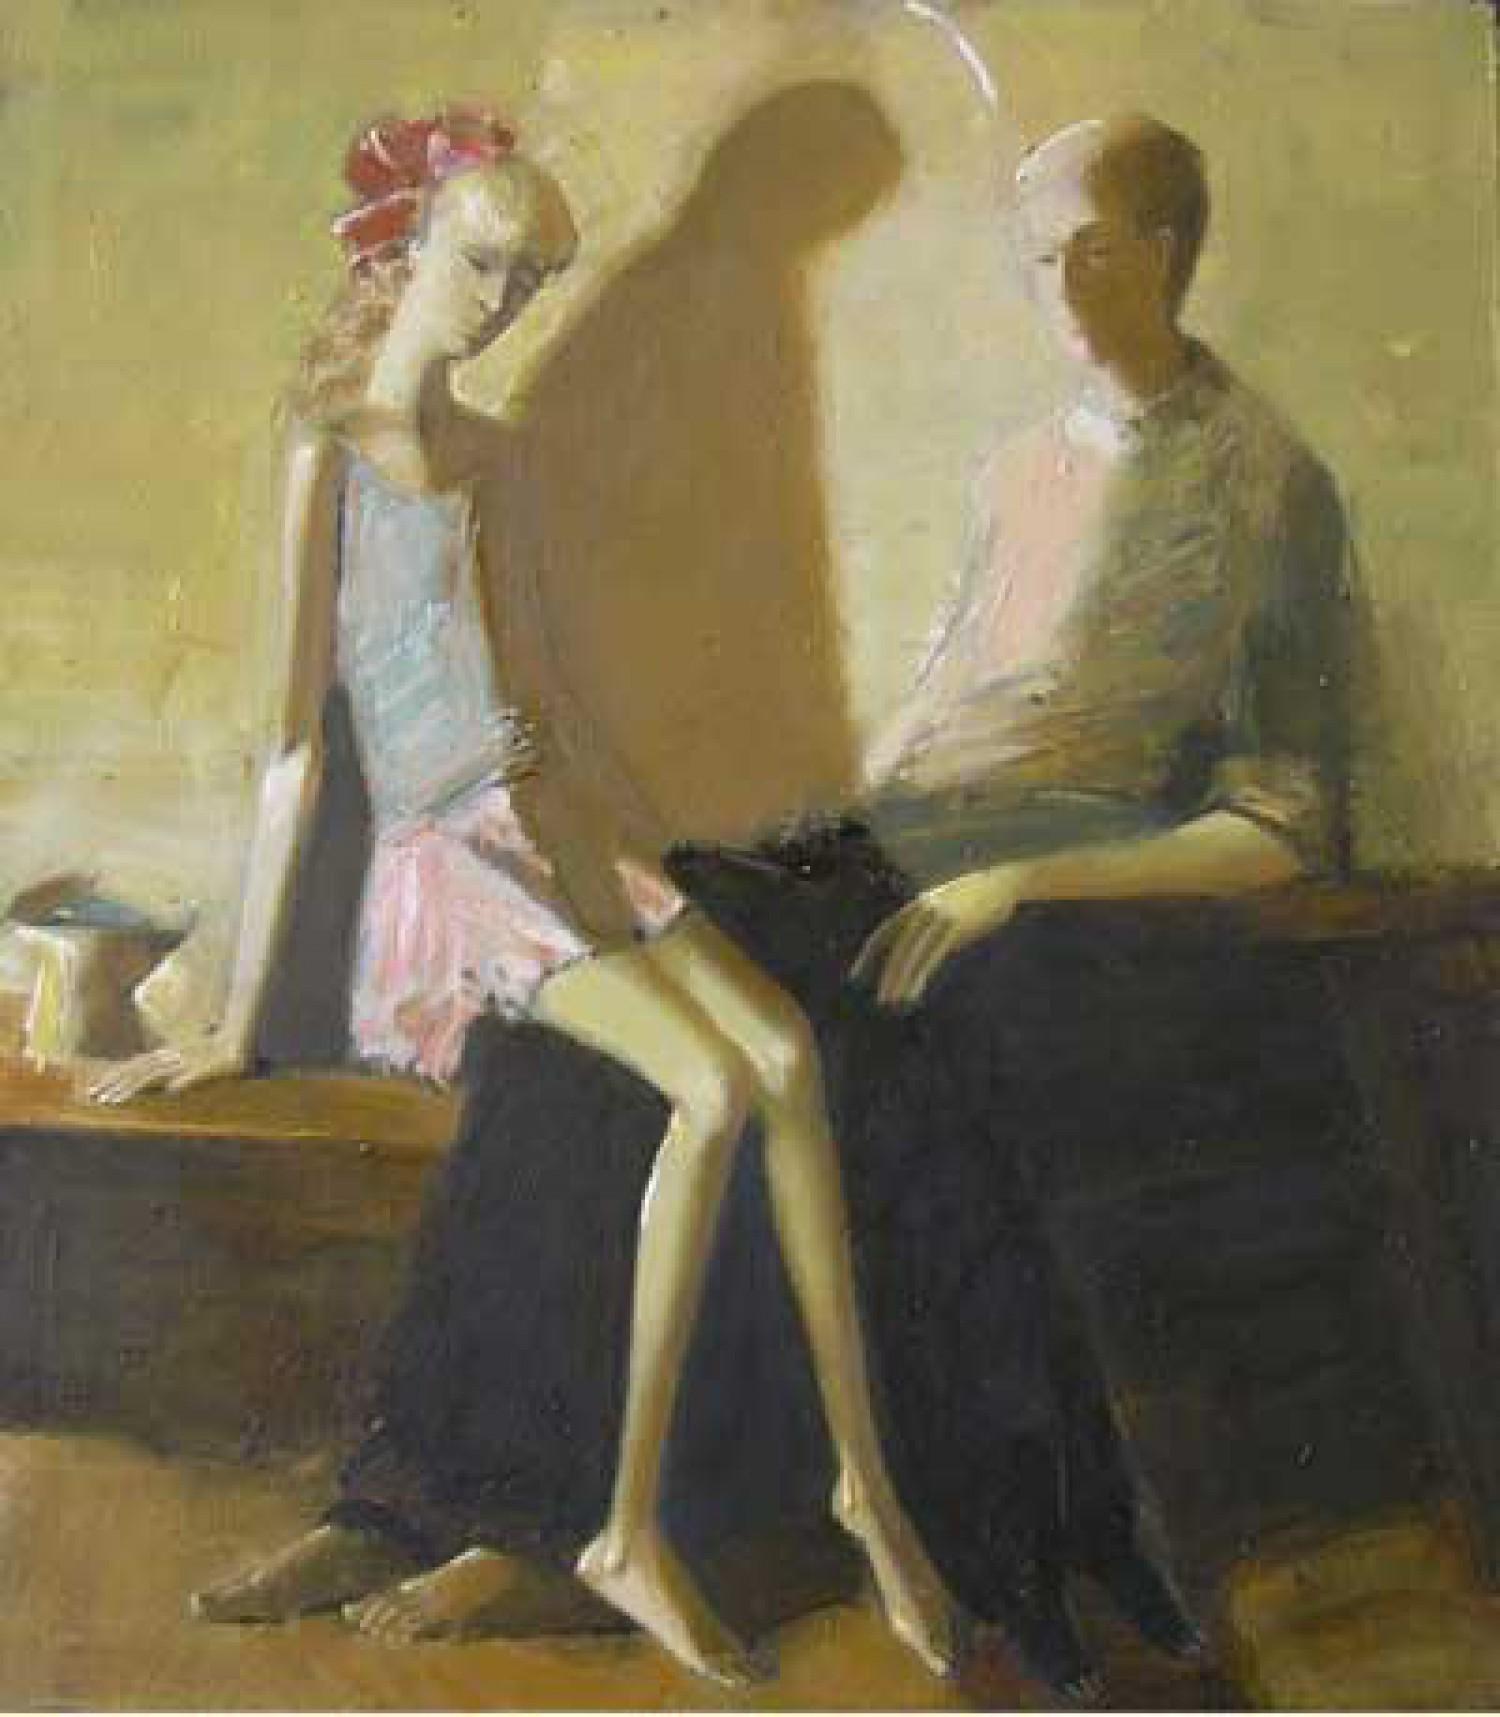 А.Н.Сериков. Втроём с чашей. 1992. 80х70. Холст, темпера, масло.